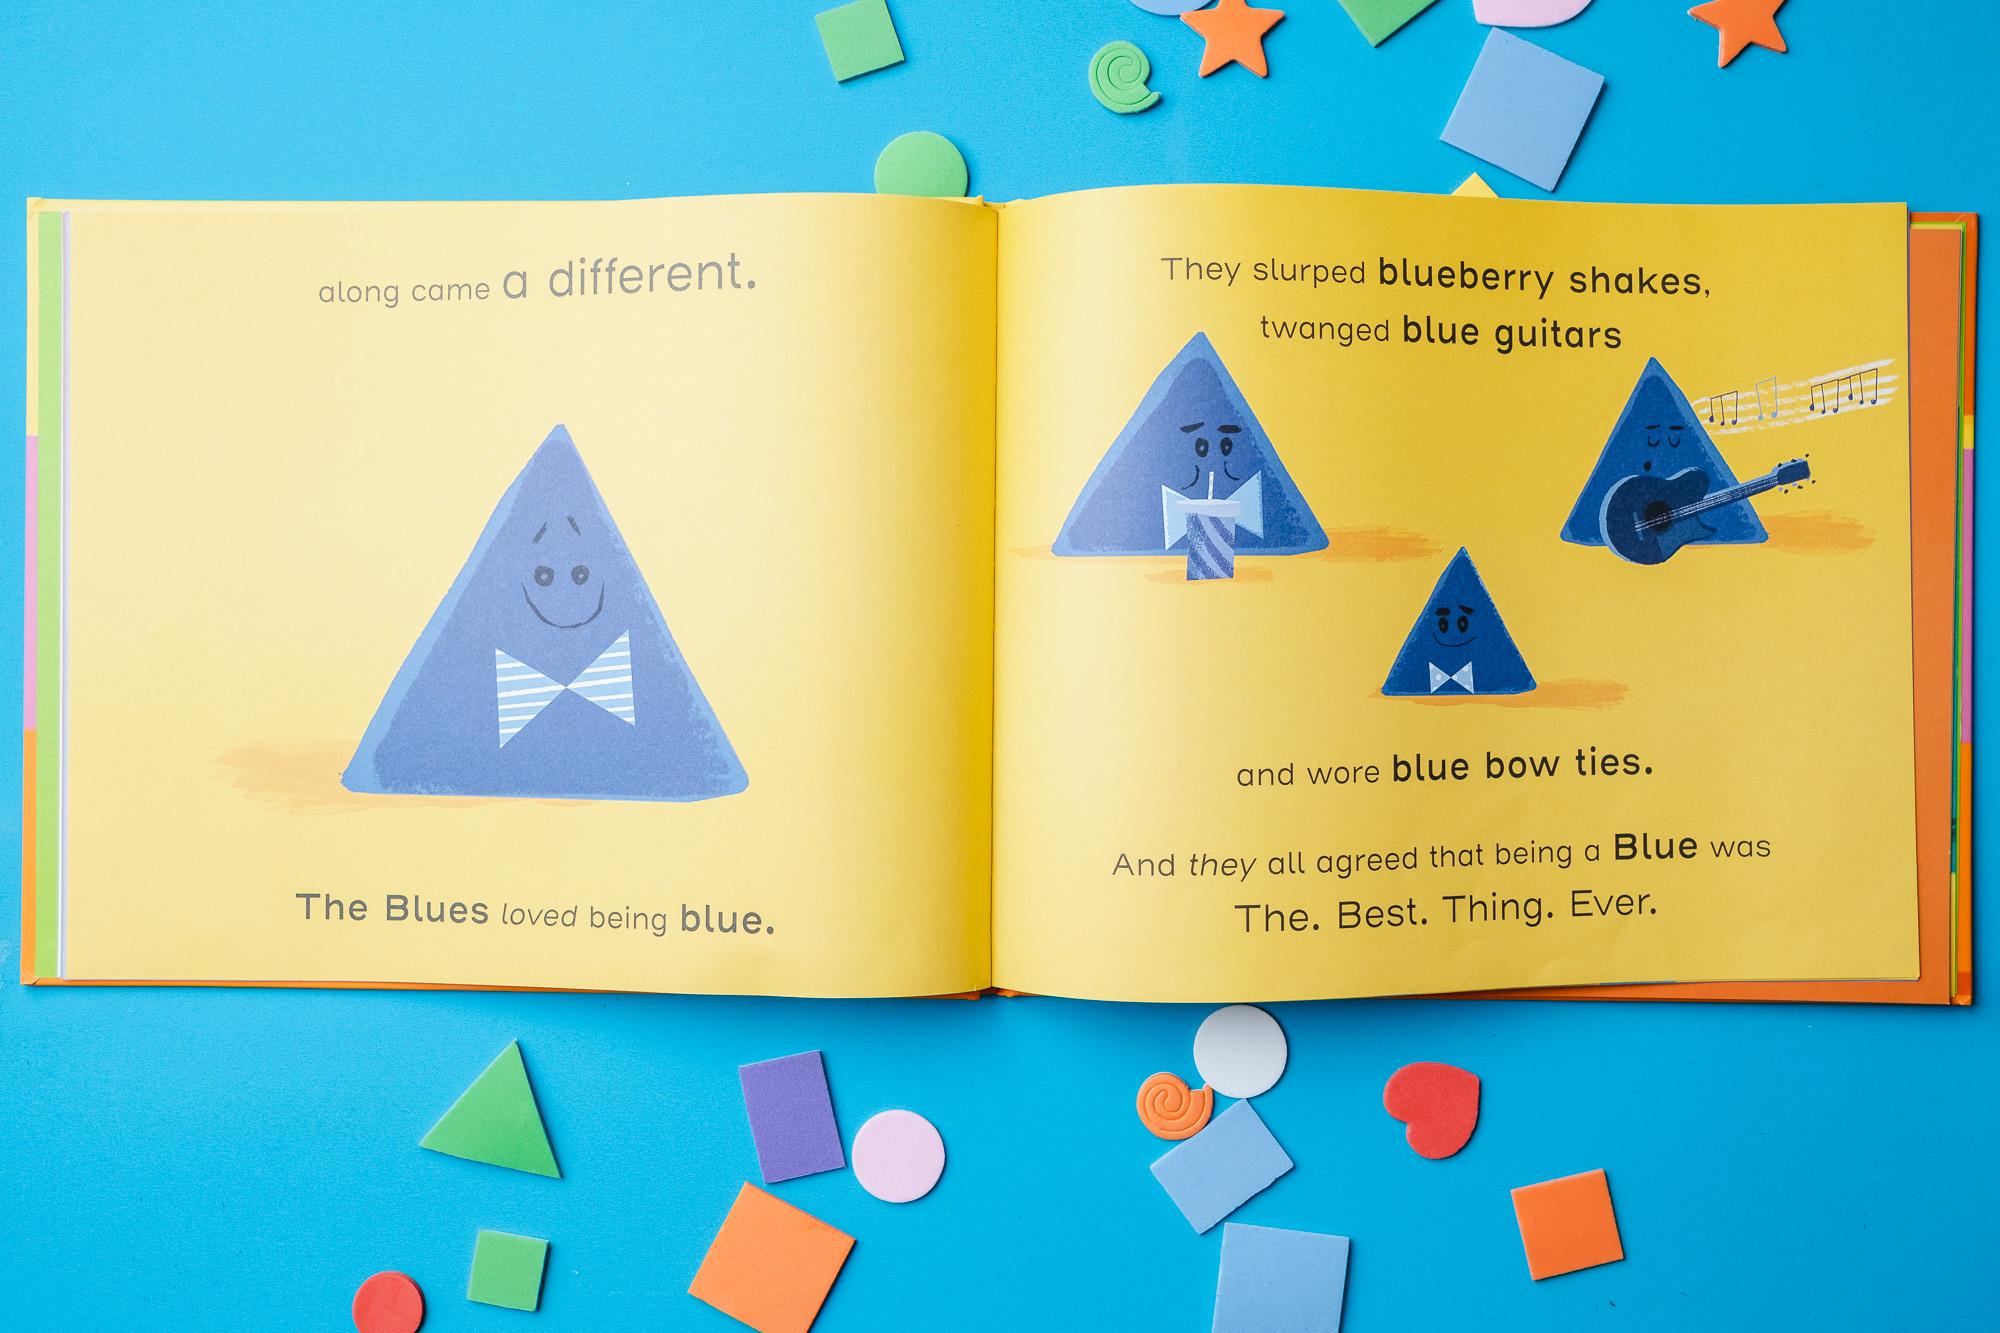 Rainbow_book_projecy-4.jpg